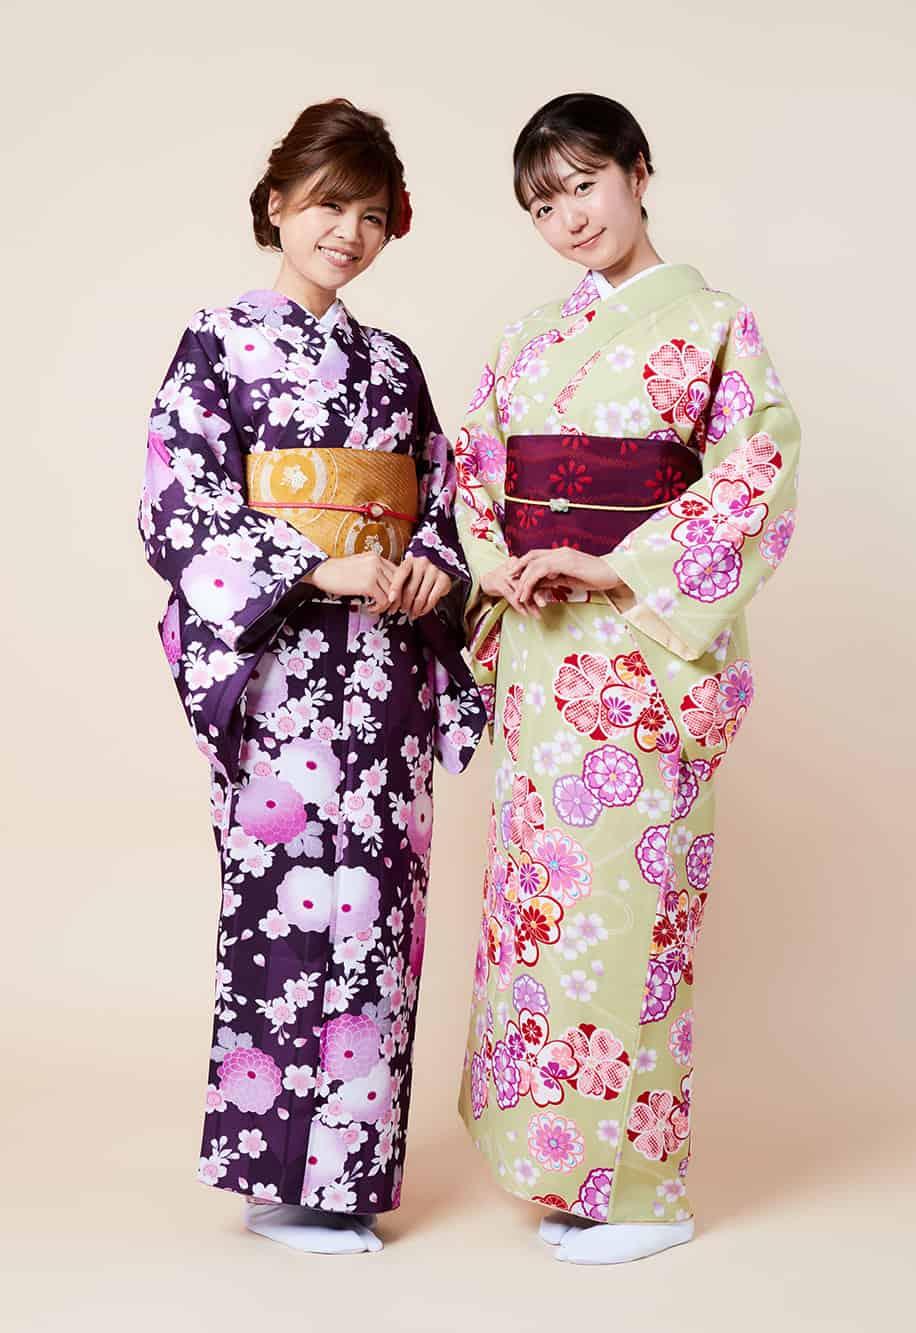 Solaniwa Onsen ที่โอซาก้า (Osaka) มีบริการให้ยืมชุดยูกาตะฟรี